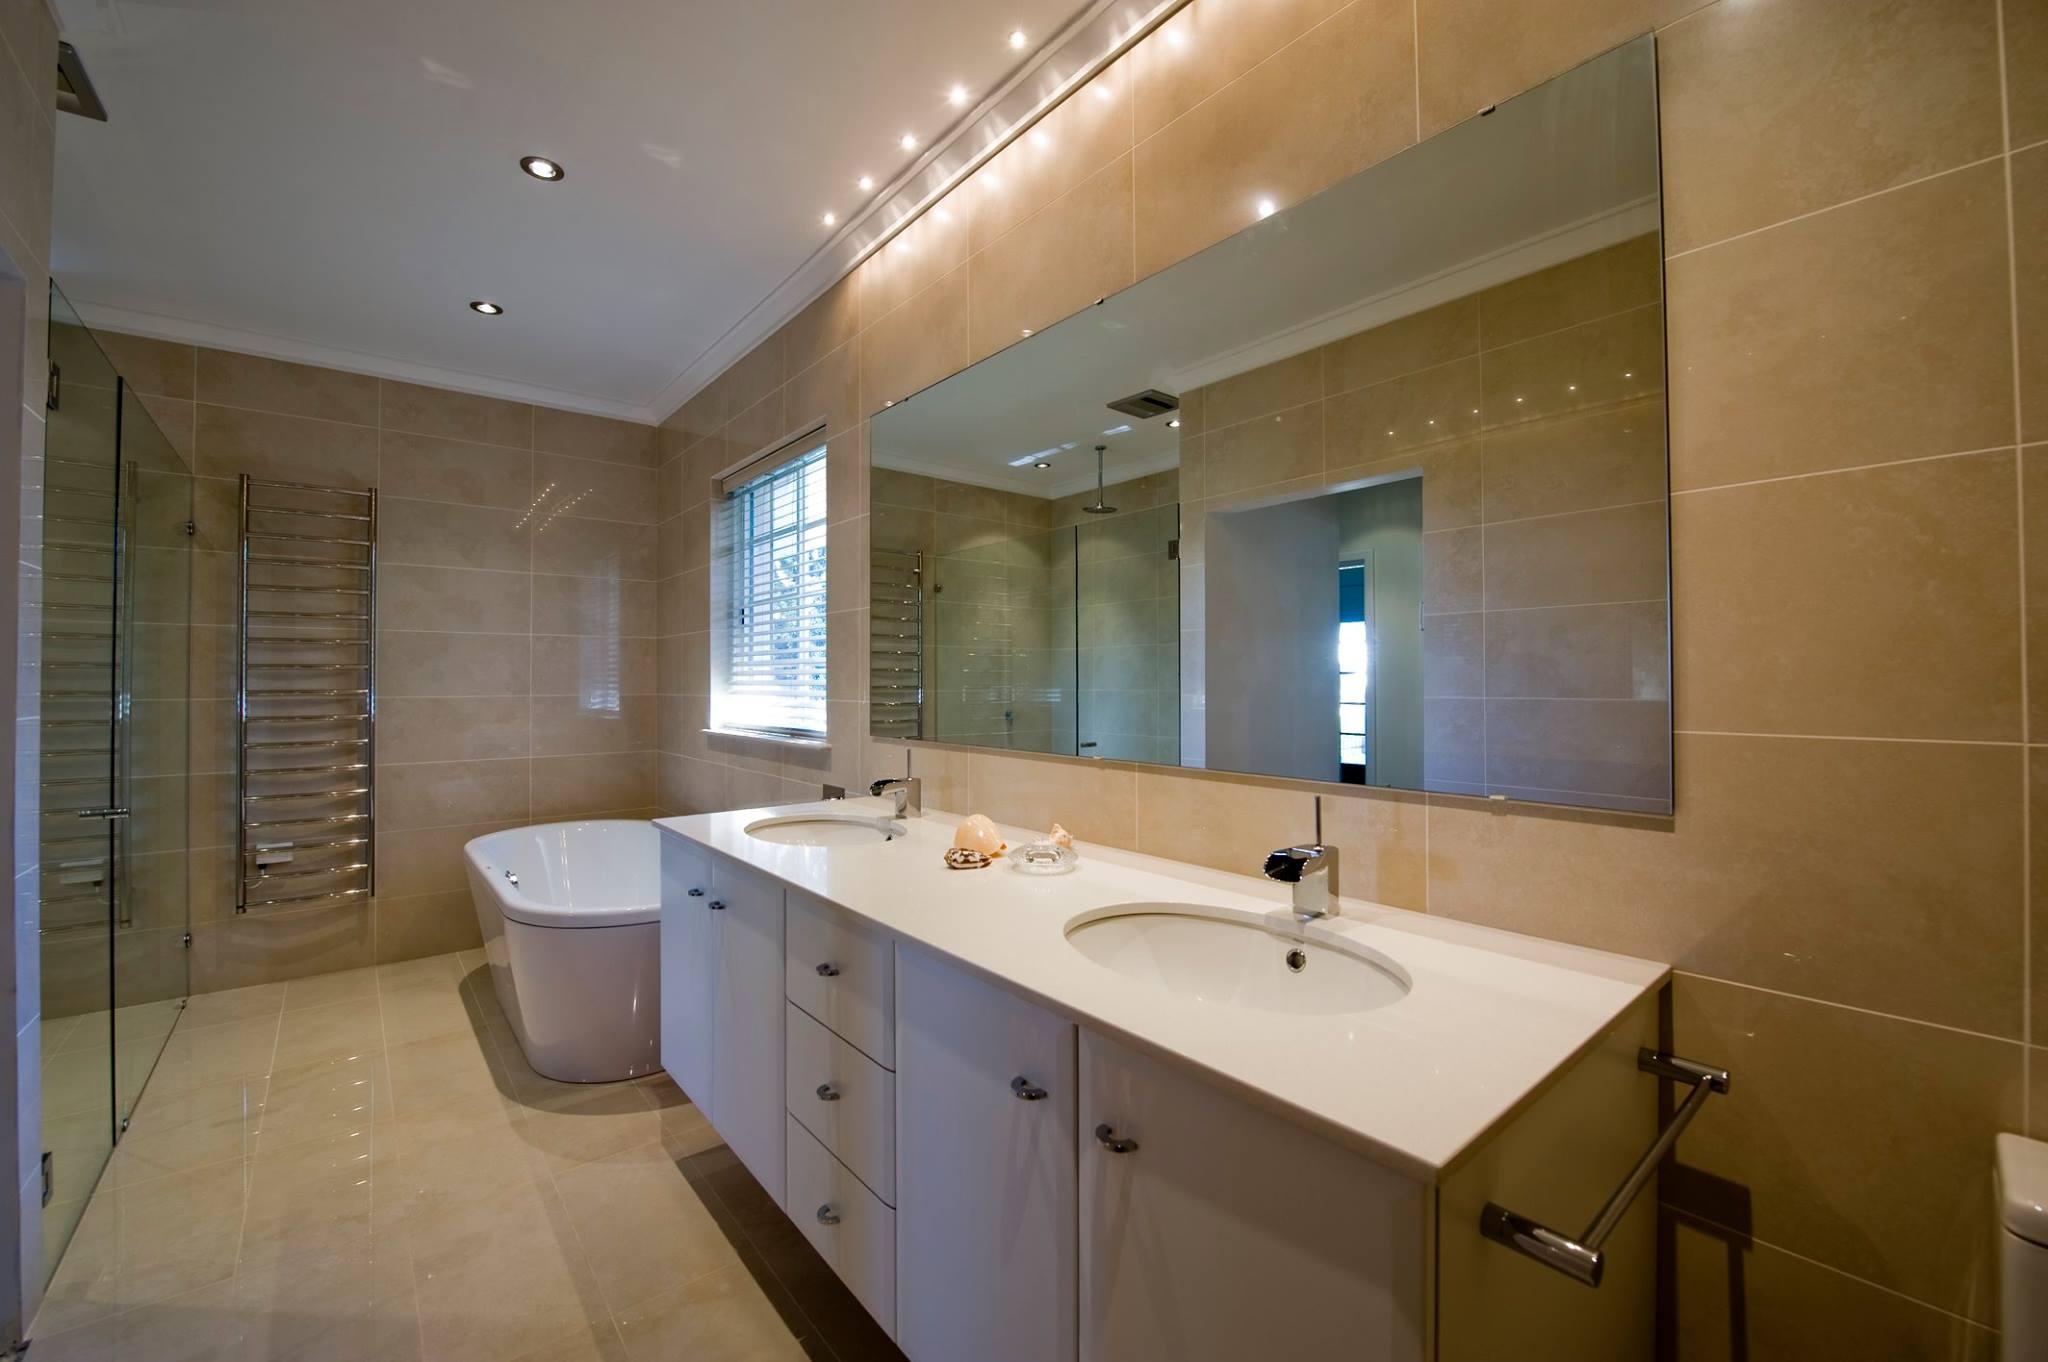 Awesome Bath Shower Tile Designs Thick Plan Your Bathroom Design Shaped Bathroom Mirror Circle Bath Fixtures Store Young Bathroom Designer Cost DarkBest Ceramic Tile For Bathroom Floors Bathroom Renovation Prospect AllStyle Bathrooms 0413768997